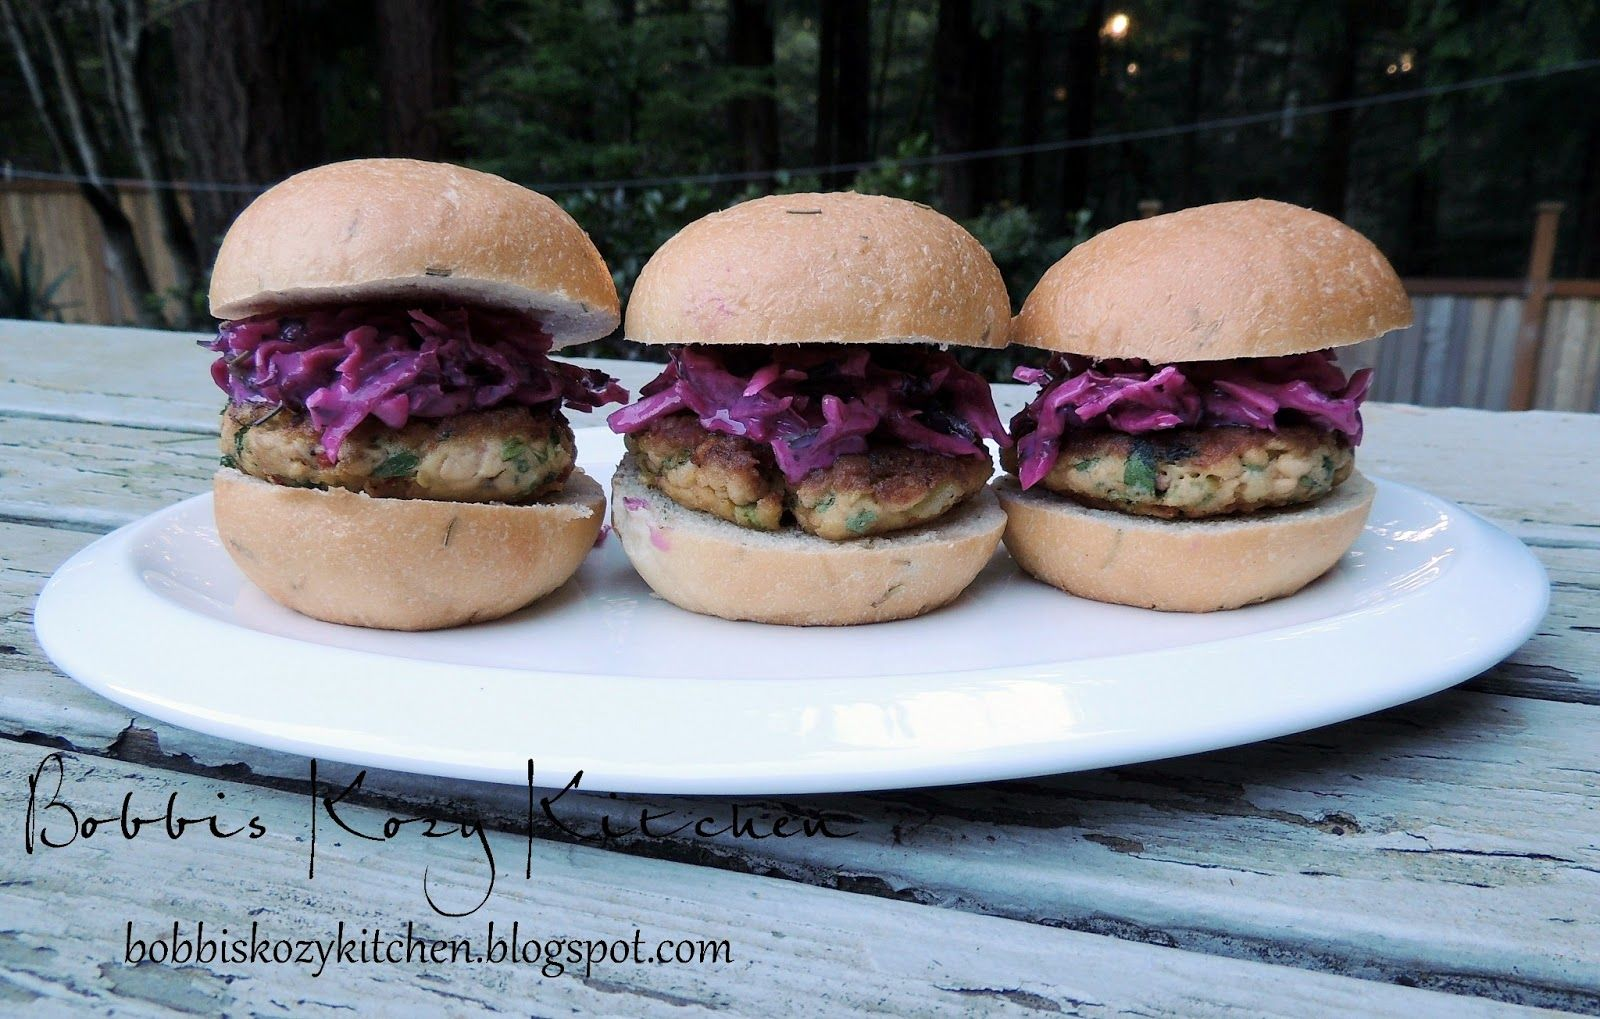 Bobbis Kozy Kitchen: Crispy Salmon Sliders with Lemon Dill Slaw #healthy #appetizers